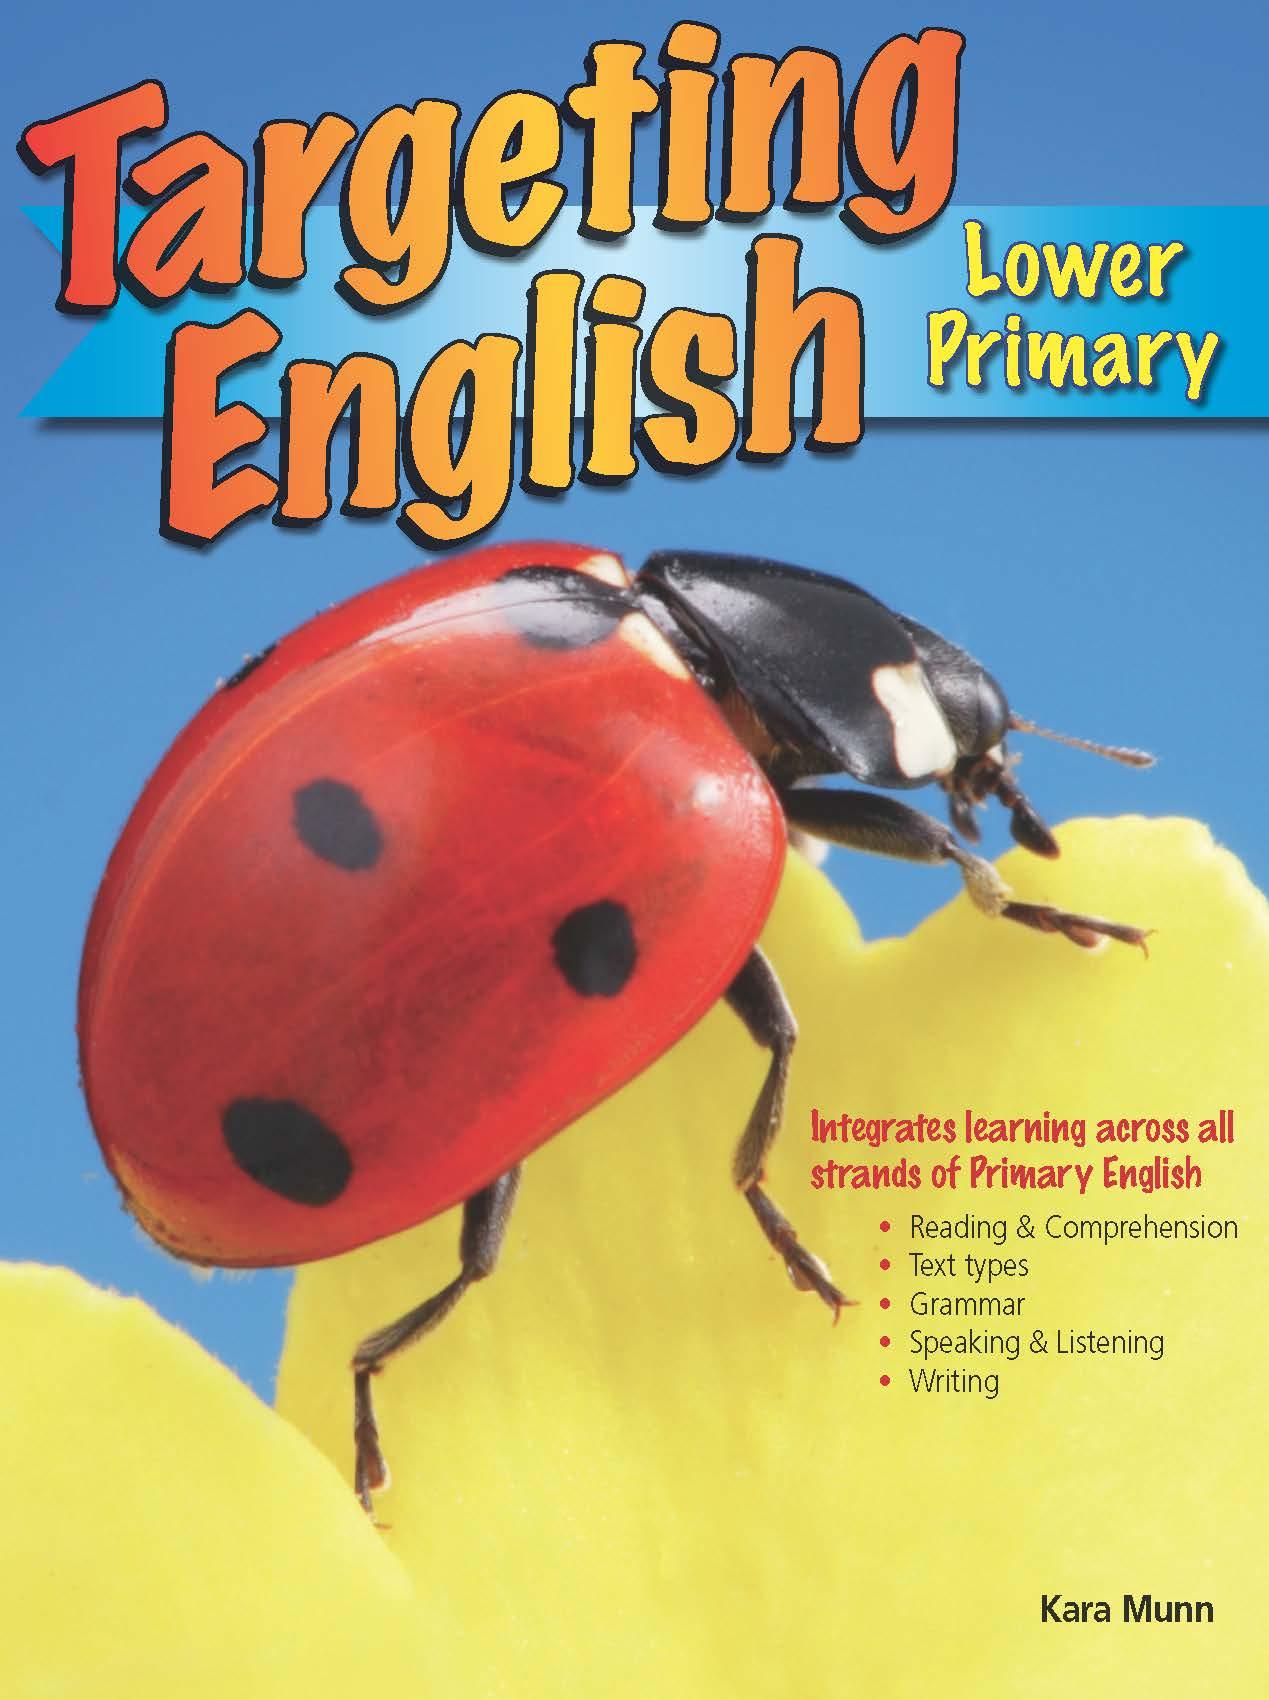 Targeting English Student Workbook Lower Primary